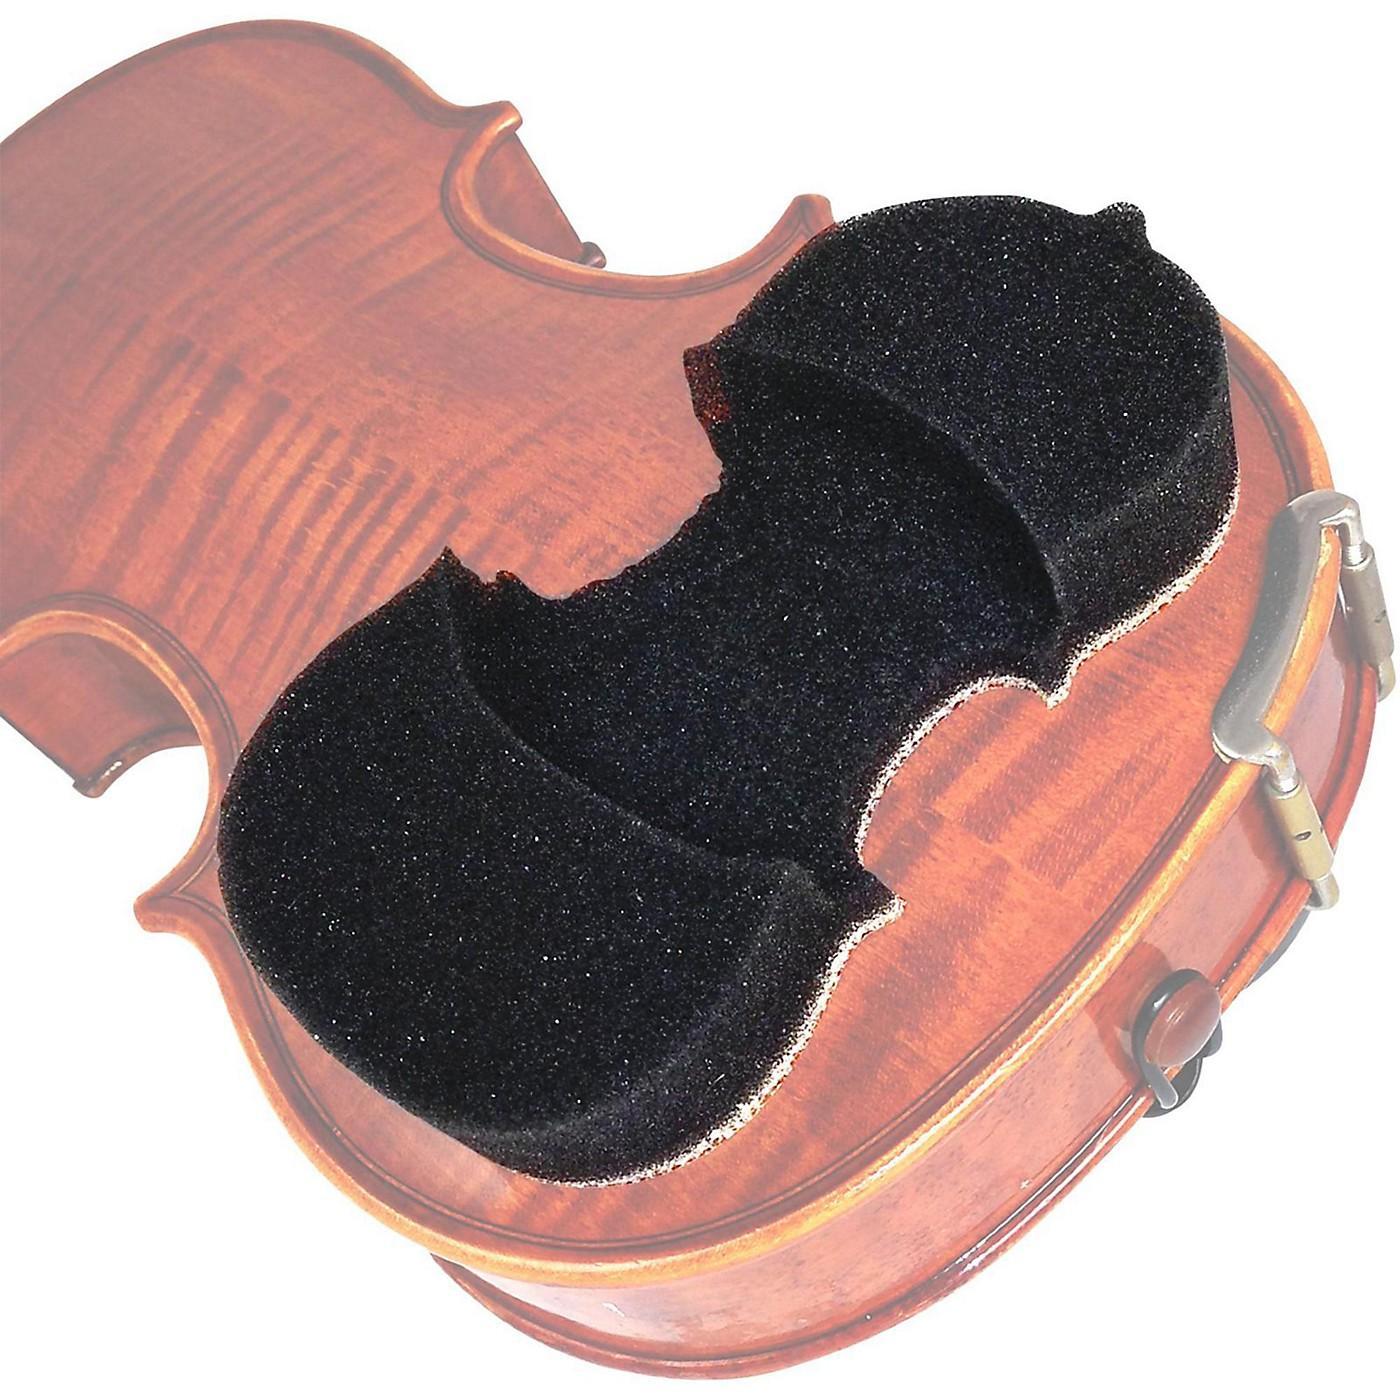 AcoustaGrip Prodigy Violin and Viola Shoulder Rest thumbnail